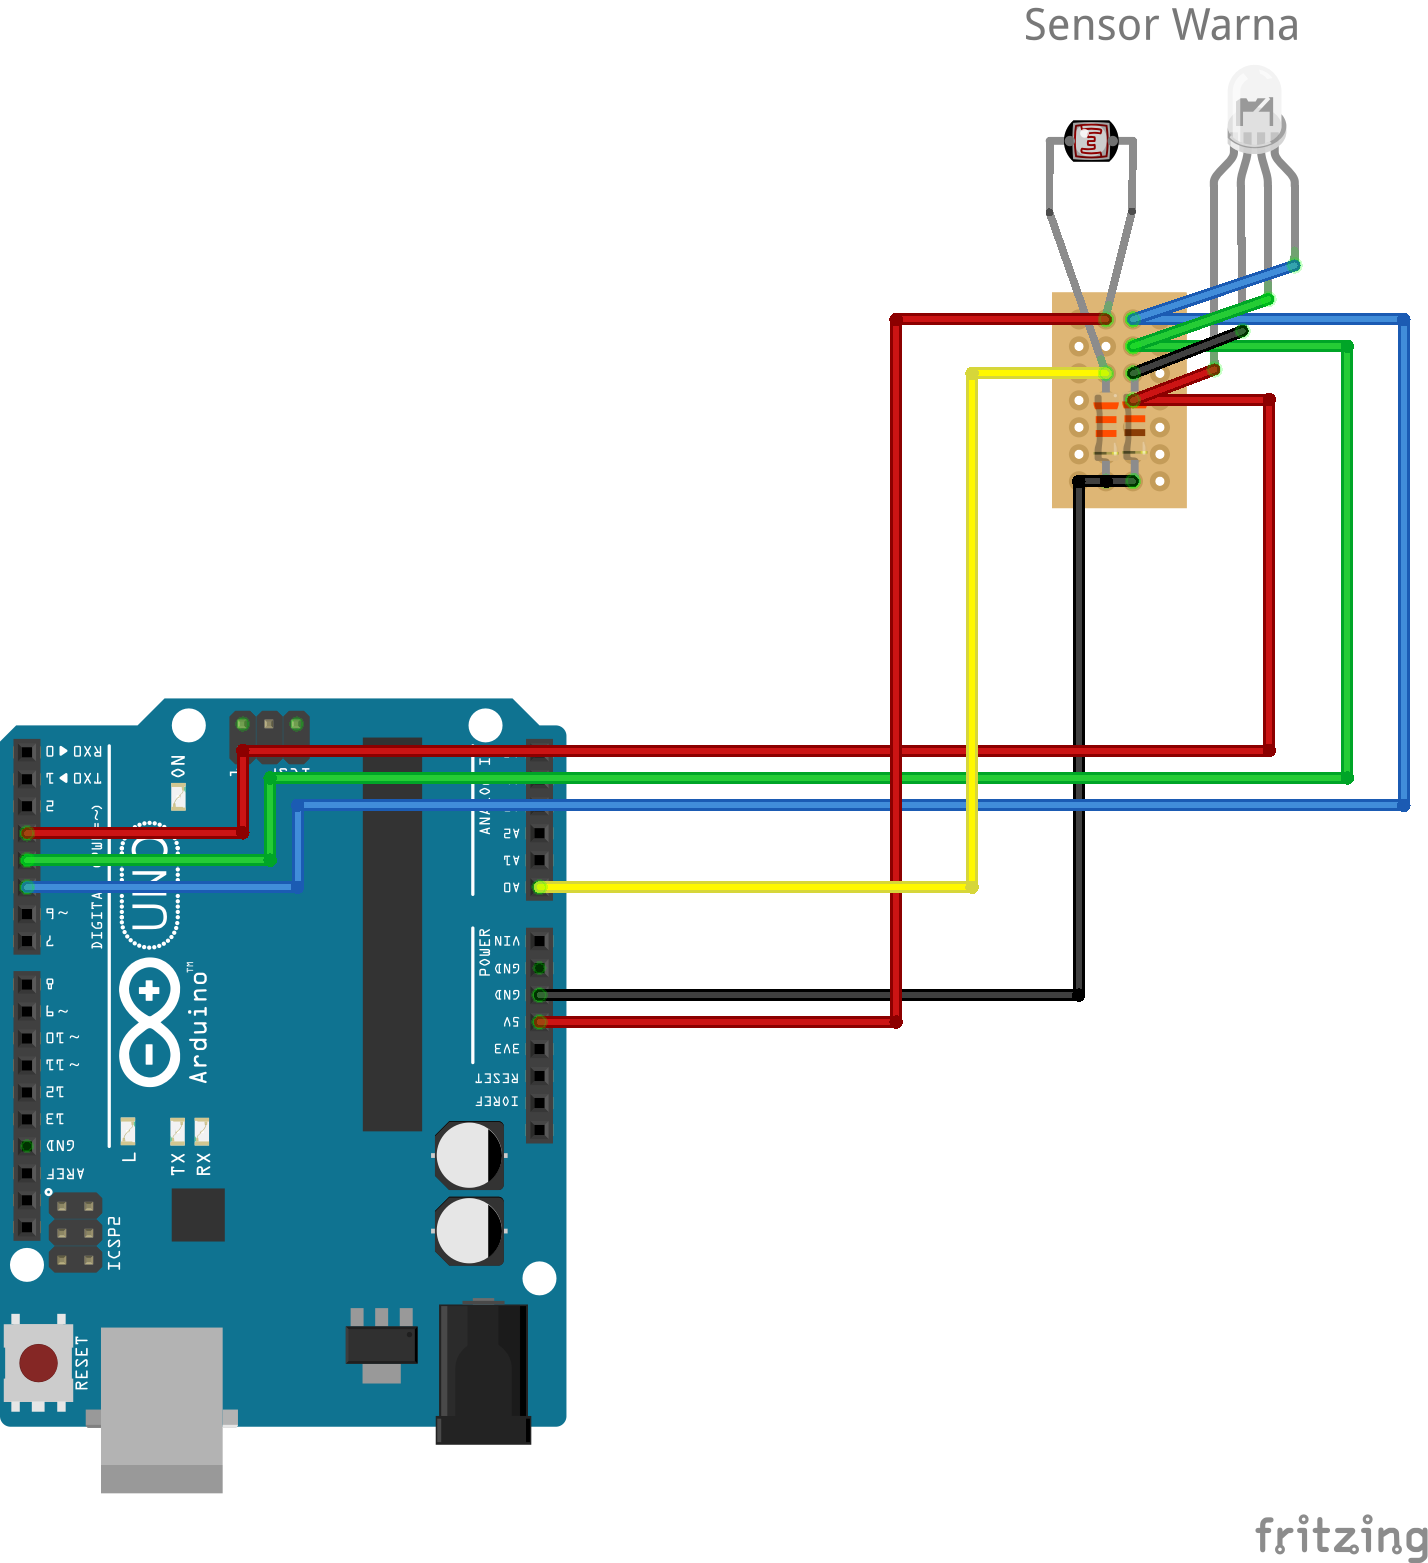 Sensor warna bb u1x5hfrjst